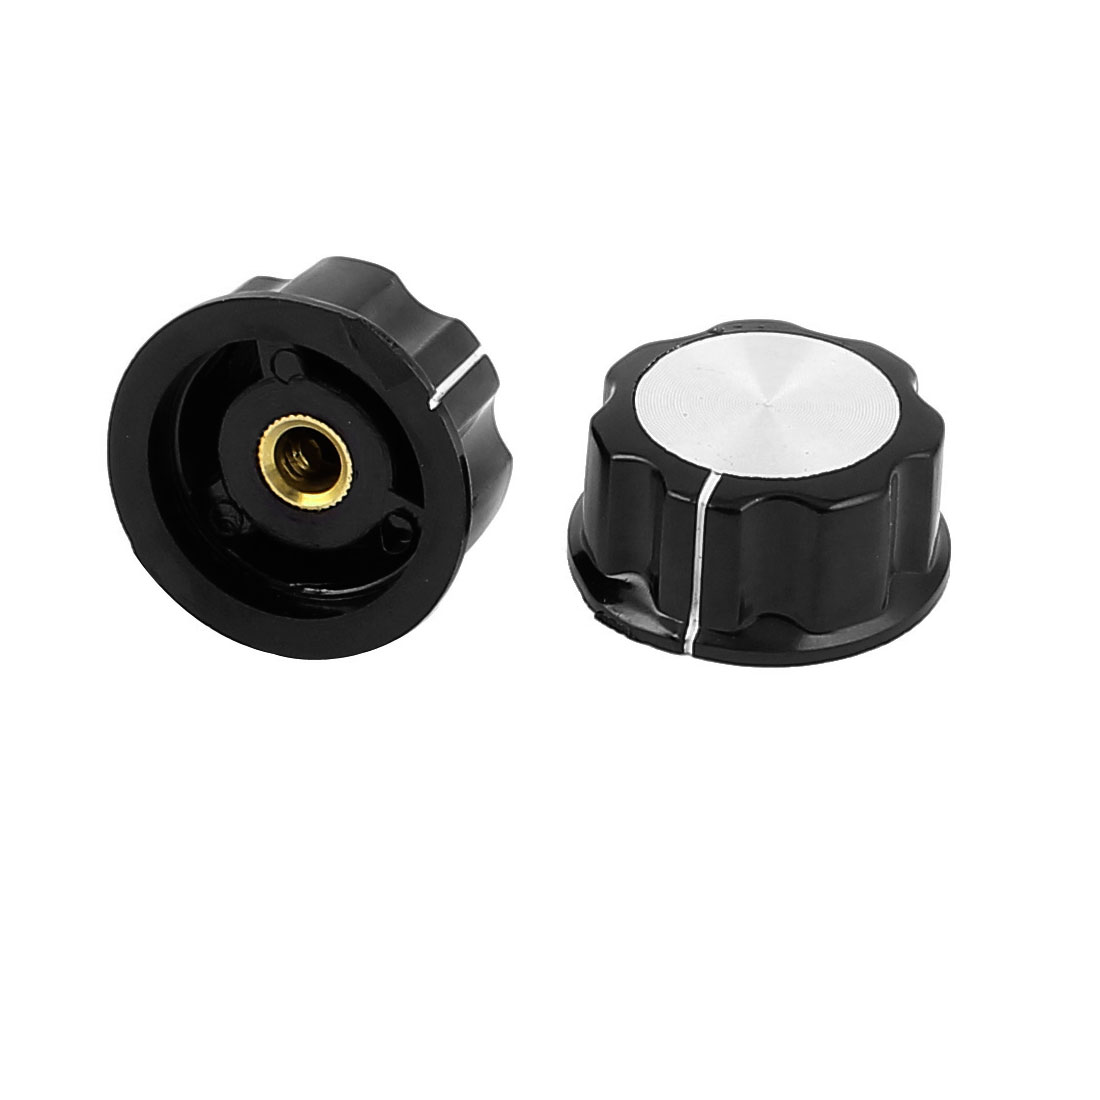 2 Pcs Black Plastic Light Lamp Dimmer Switch Control Potentiometer Rotary Knob Cap for 6mm Shaft